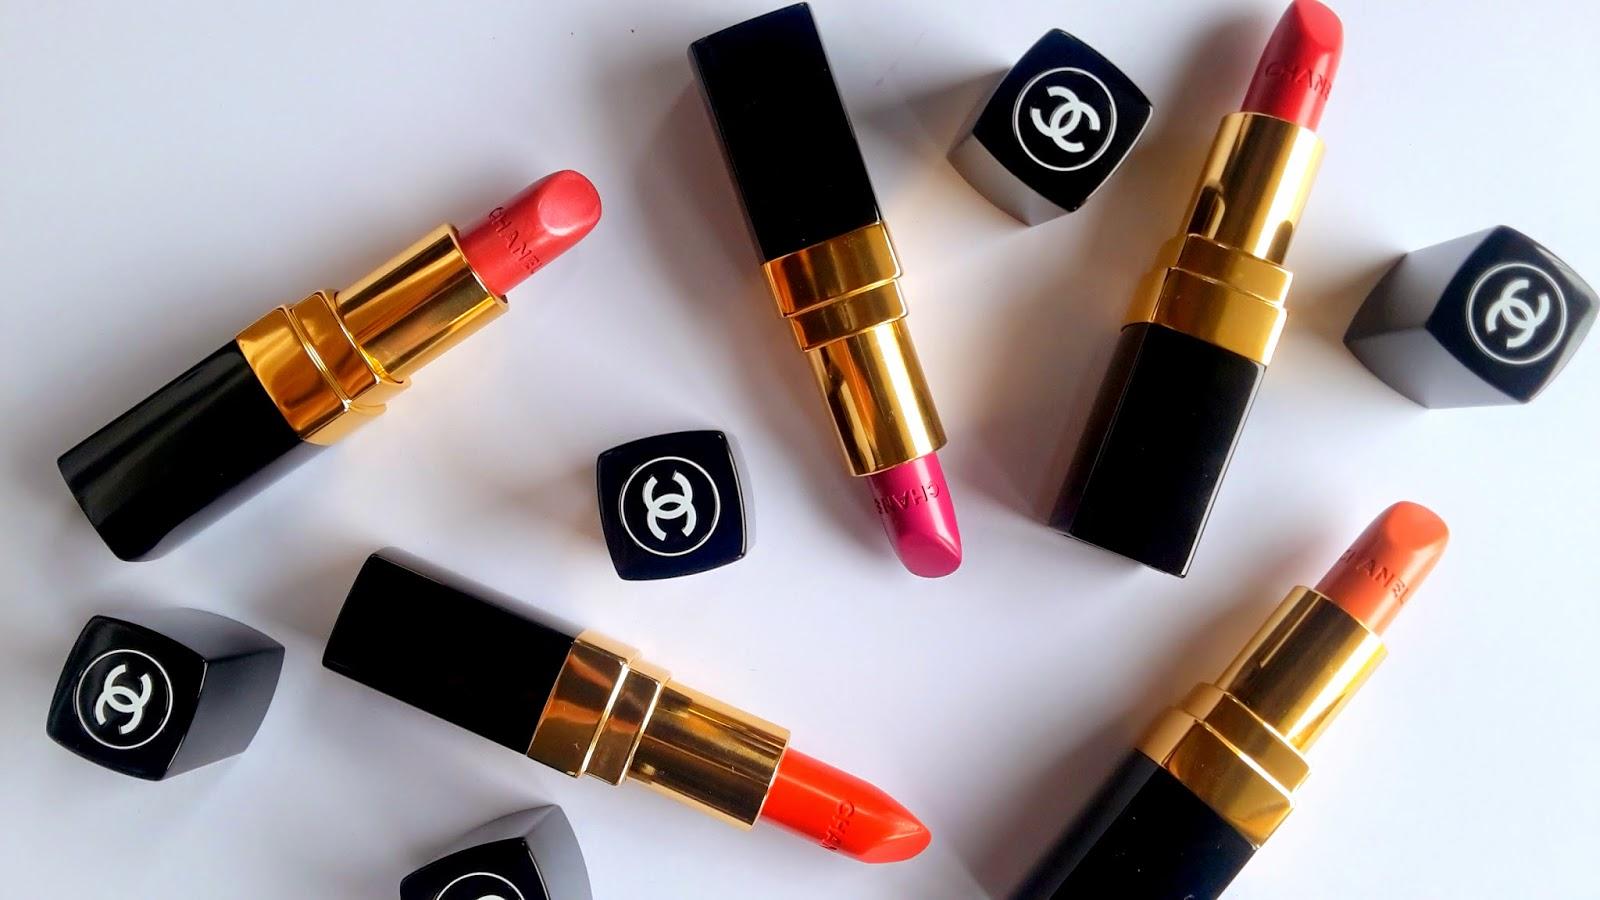 rouge coco chanel lipstick rossetto